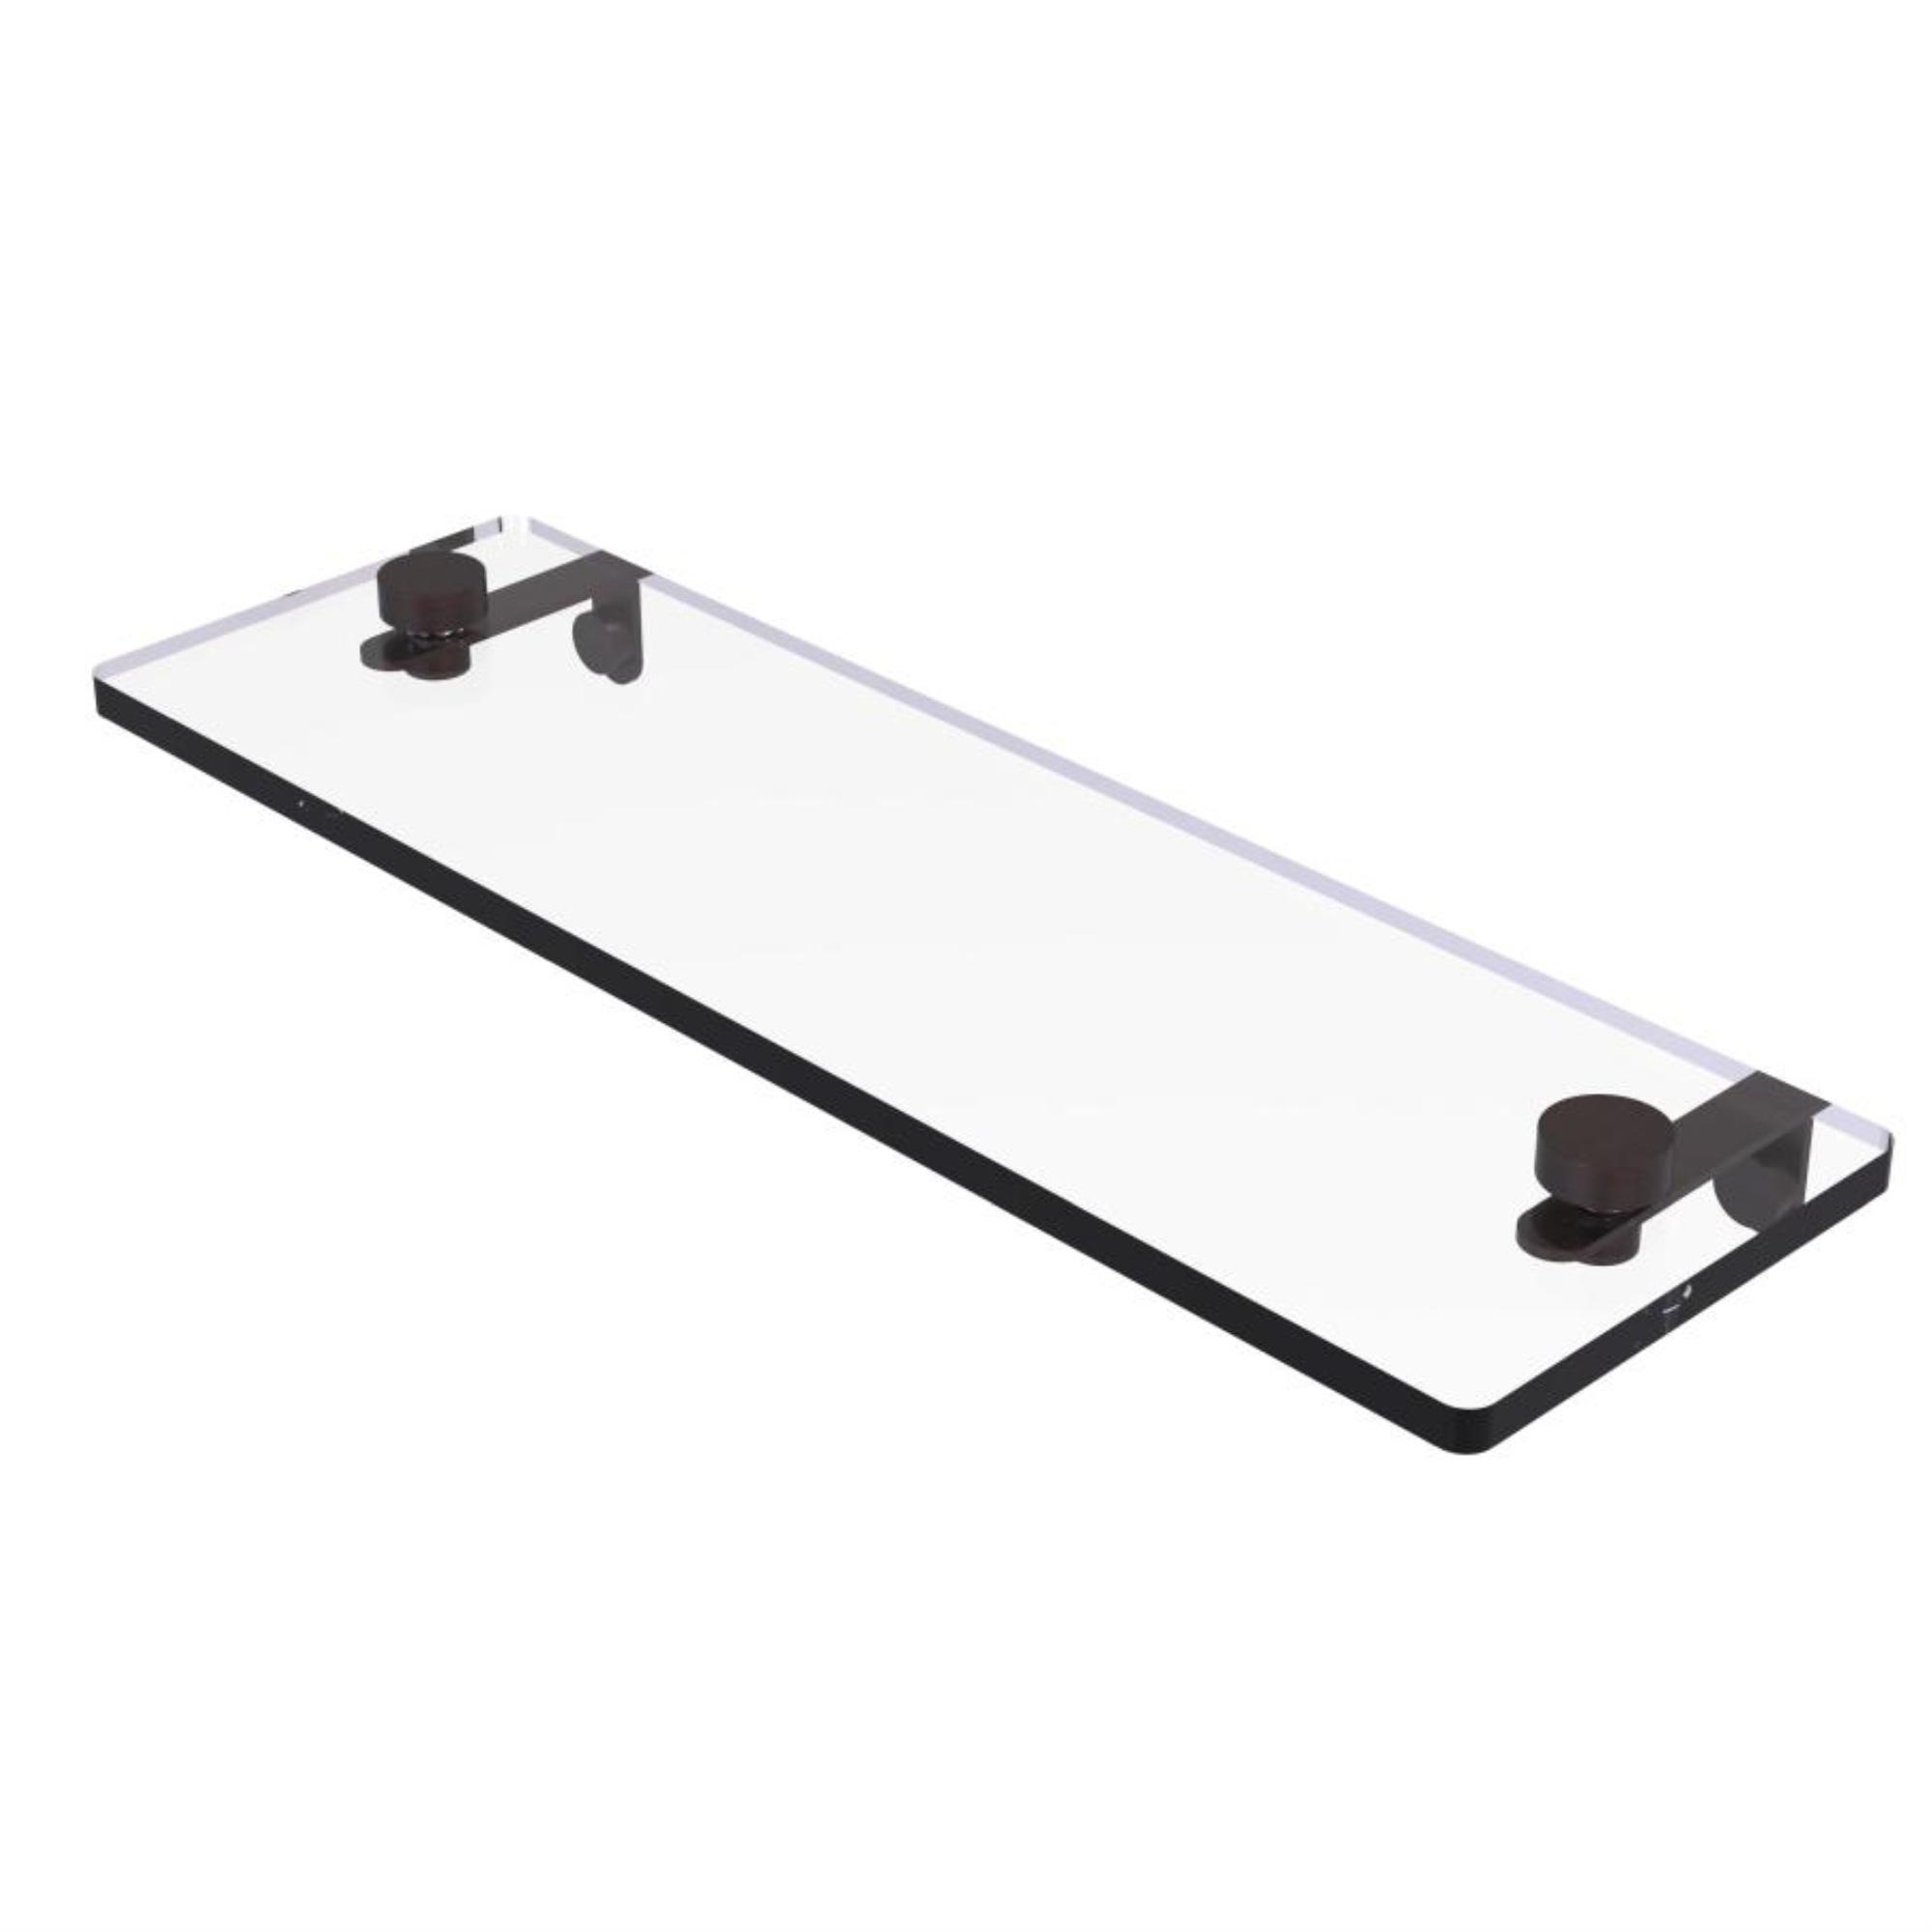 16 Inch Glass Vanity Shelf with Beveled Edges - NS-1/16-VB